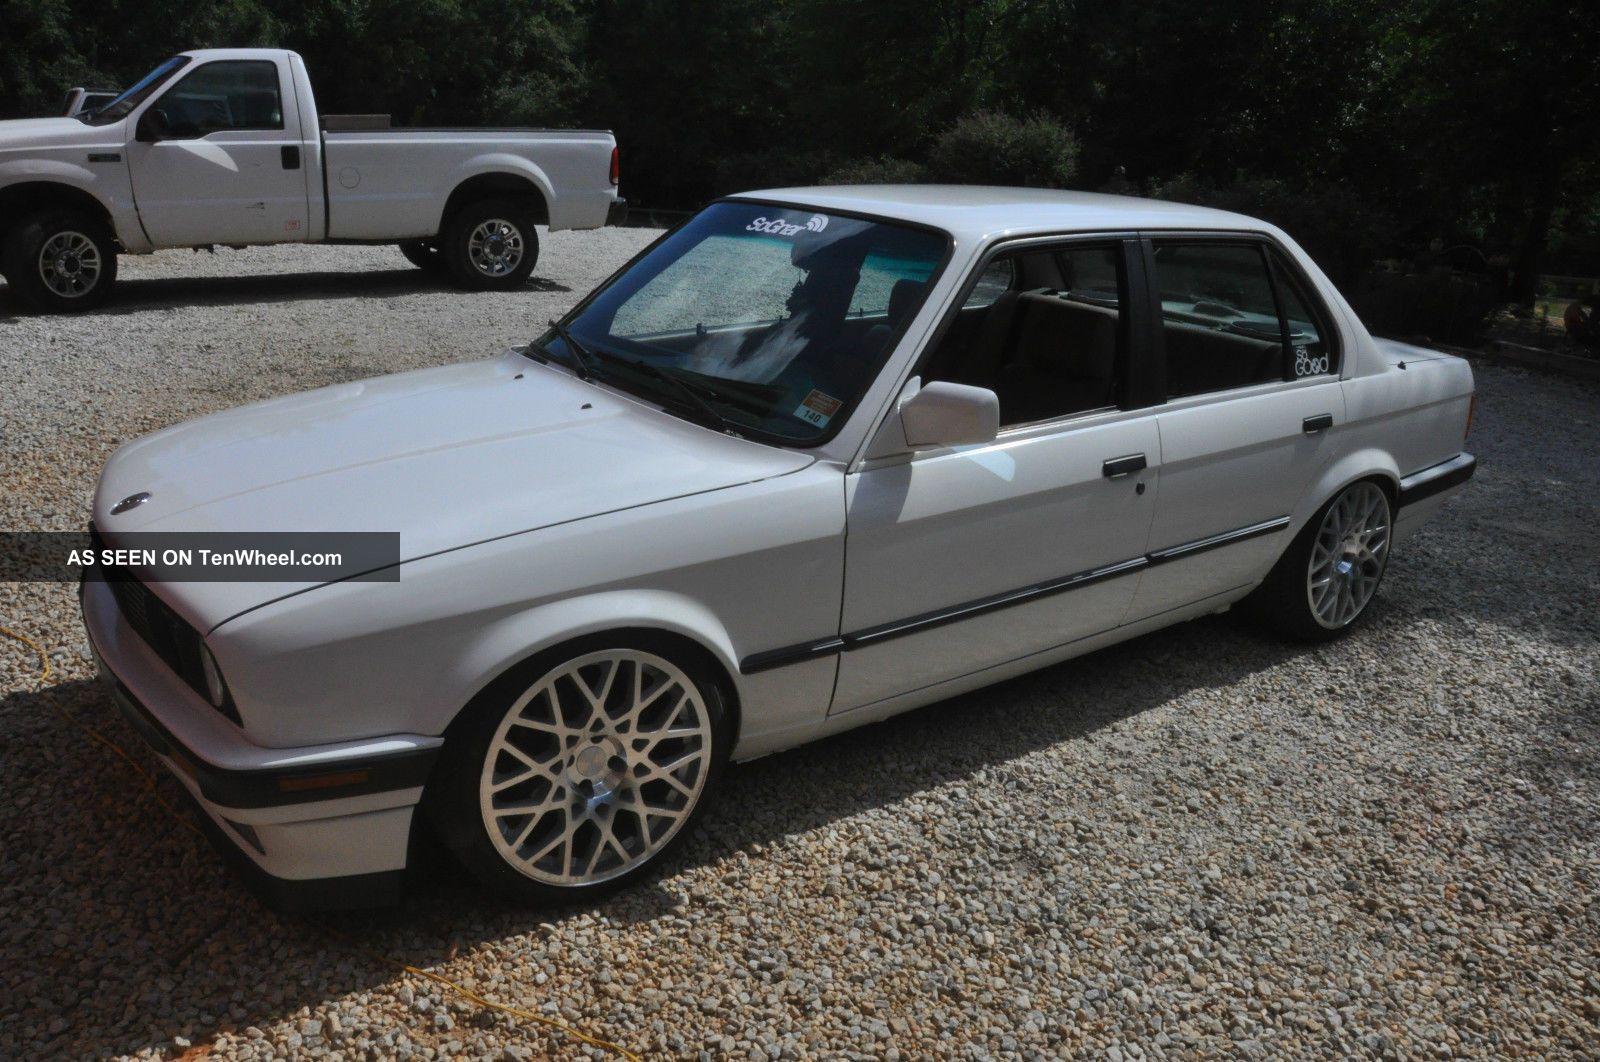 E30: 1991 Bmw 318i (m52 Swapped) 3-Series photo